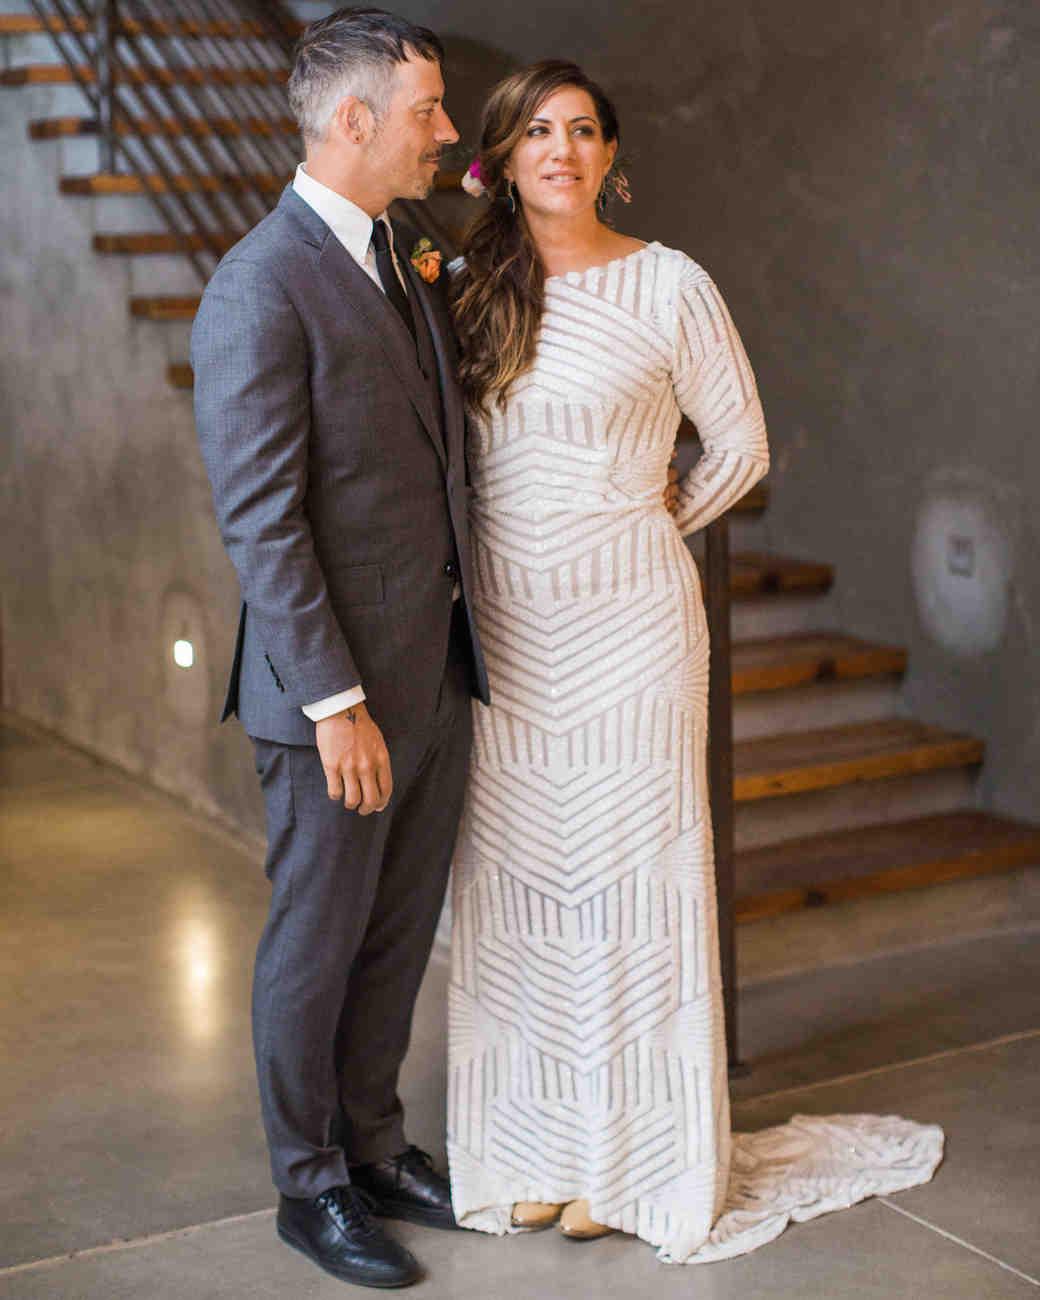 lara-chad-wedding-couple-624-s112306-1115.jpg